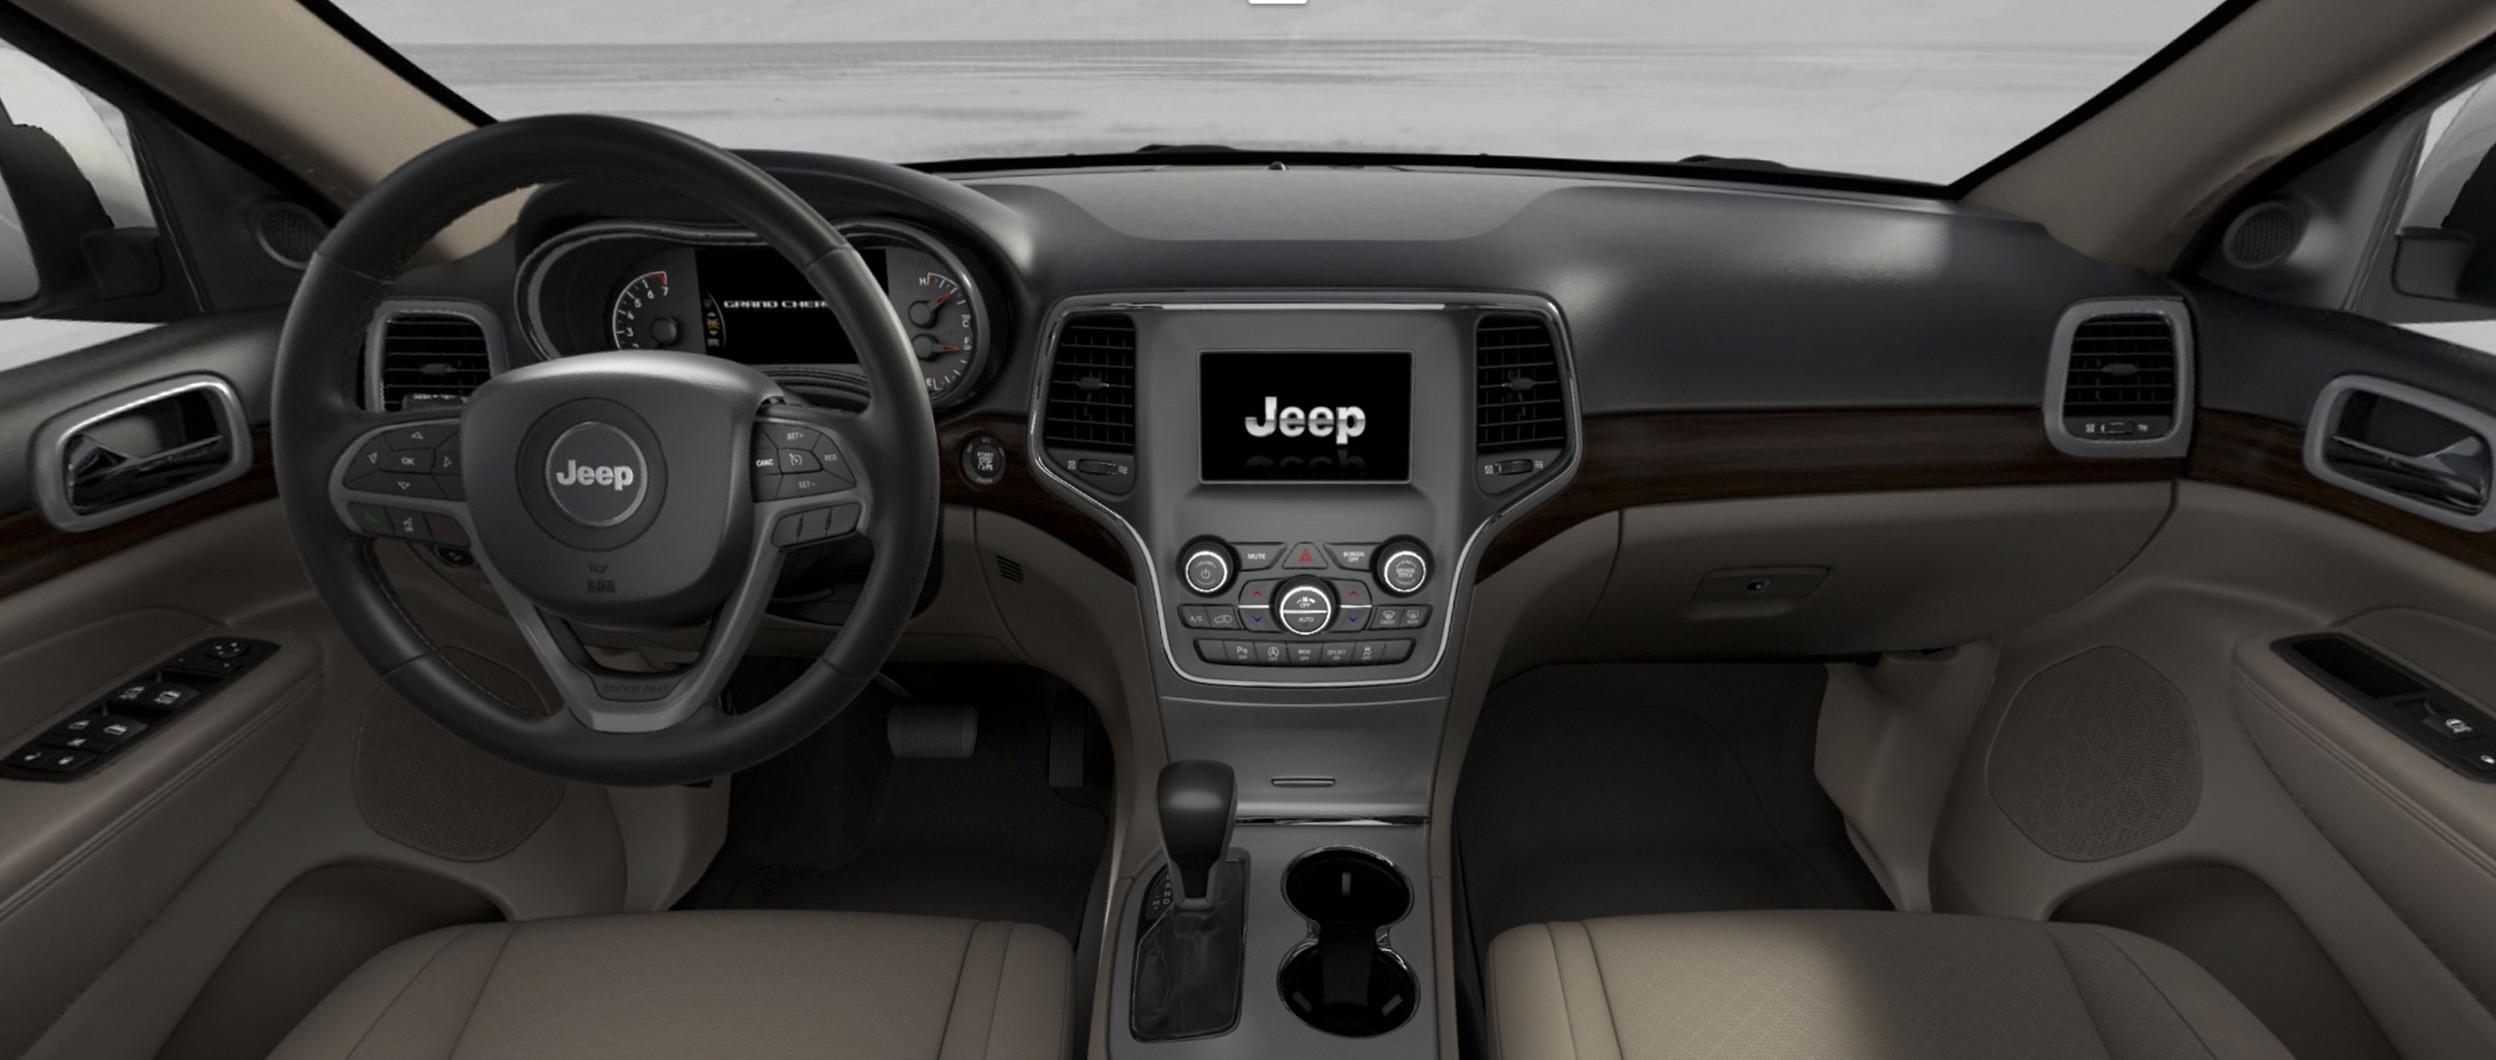 2018 jeep grand cherokee interior gallery - Jeep grand cherokee laredo interior ...